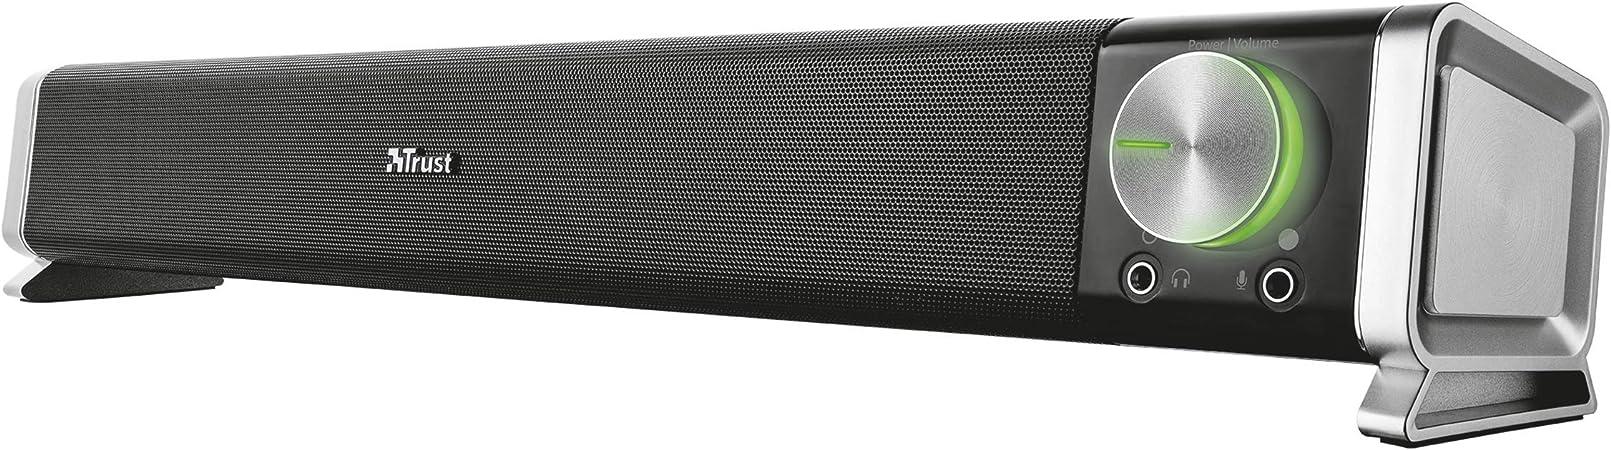 Amazon.nl-Trust Asto Soundbar Luidspreker PC TV Speakers, Zwart-aanbieding